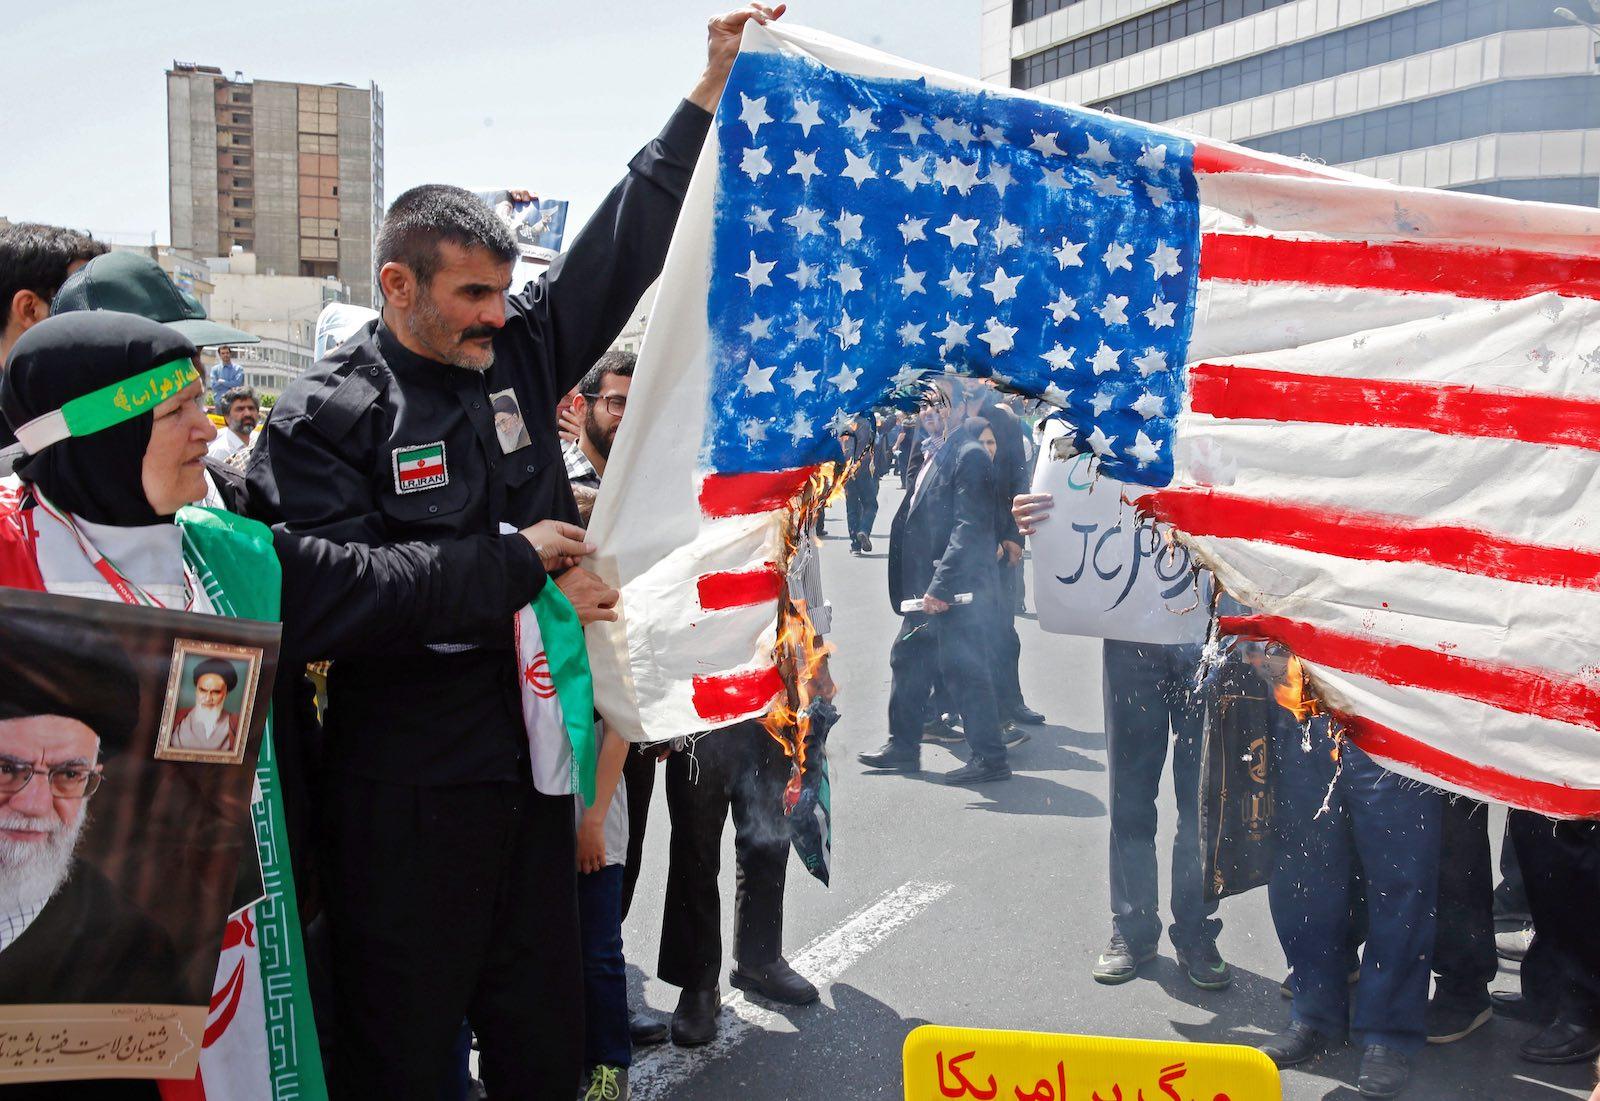 Demonstrators burn a makeshift US flag in Tehran this month (Photo: STR via Getty)